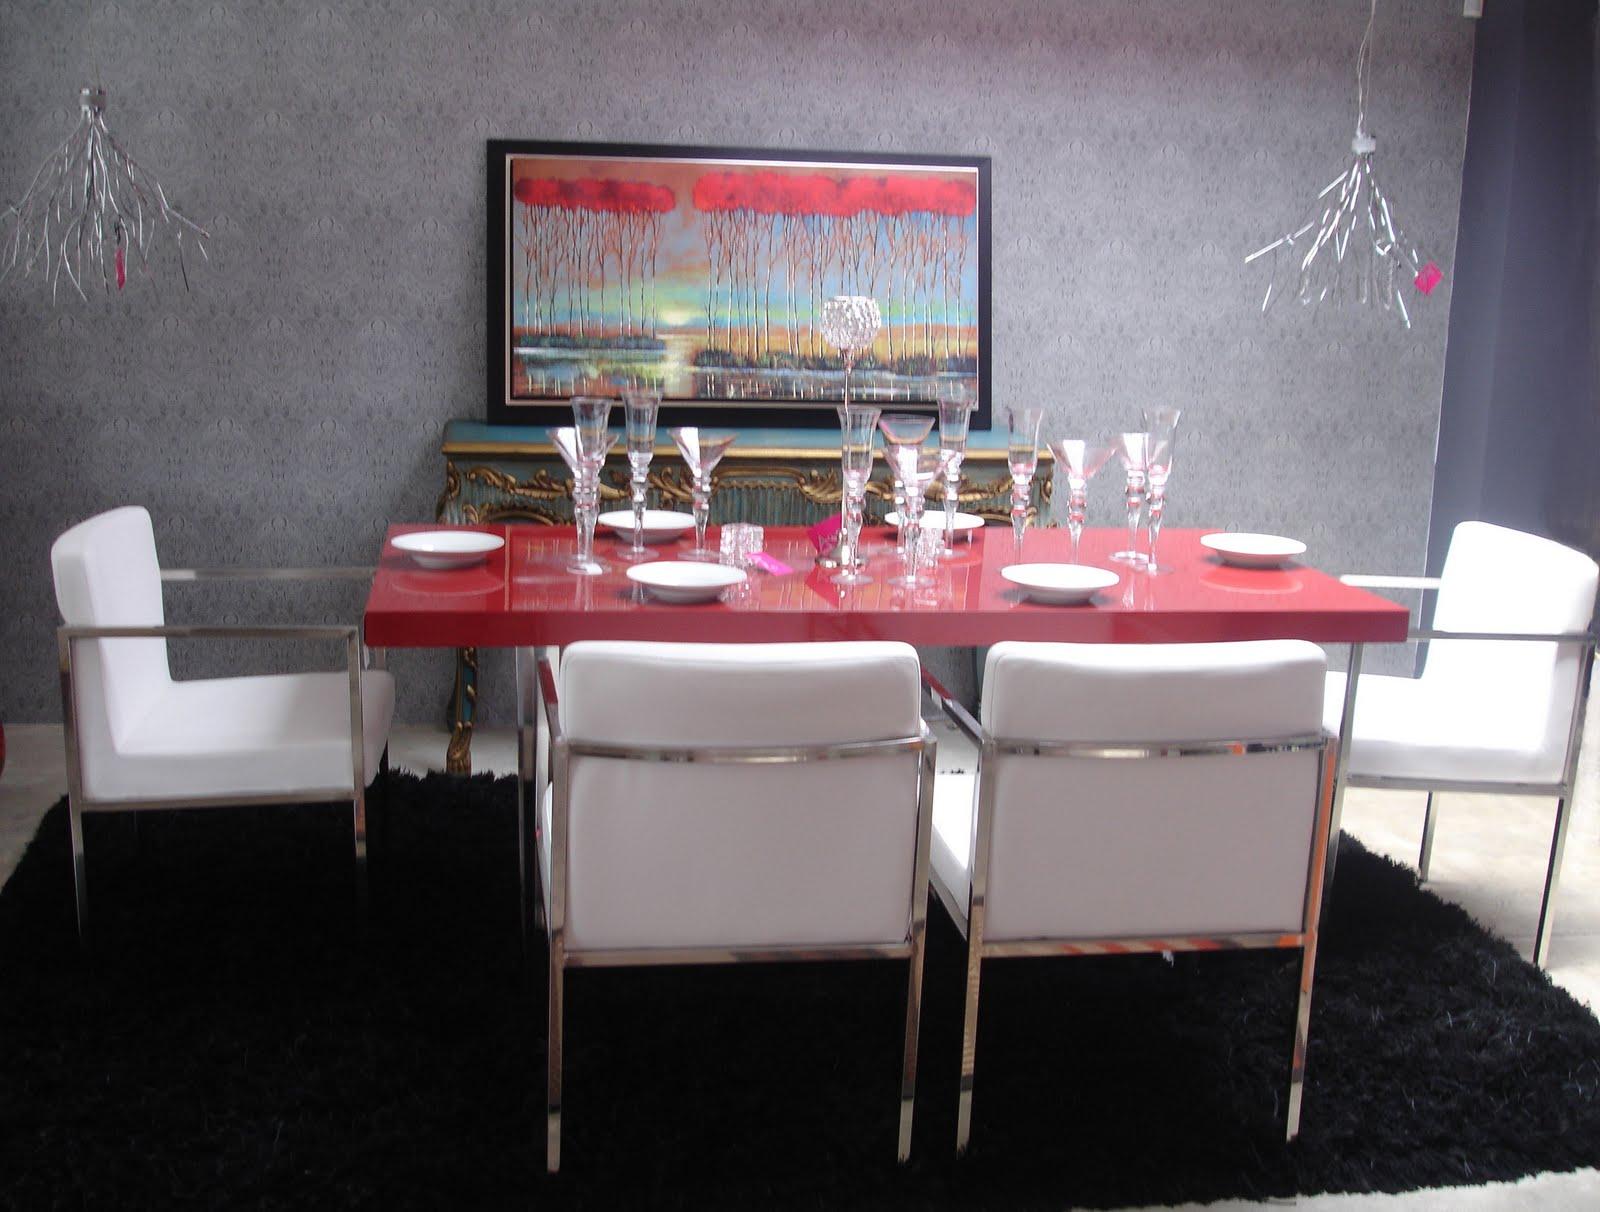 Comedores minimalistas bogota for Comedores 6 puestos bogota